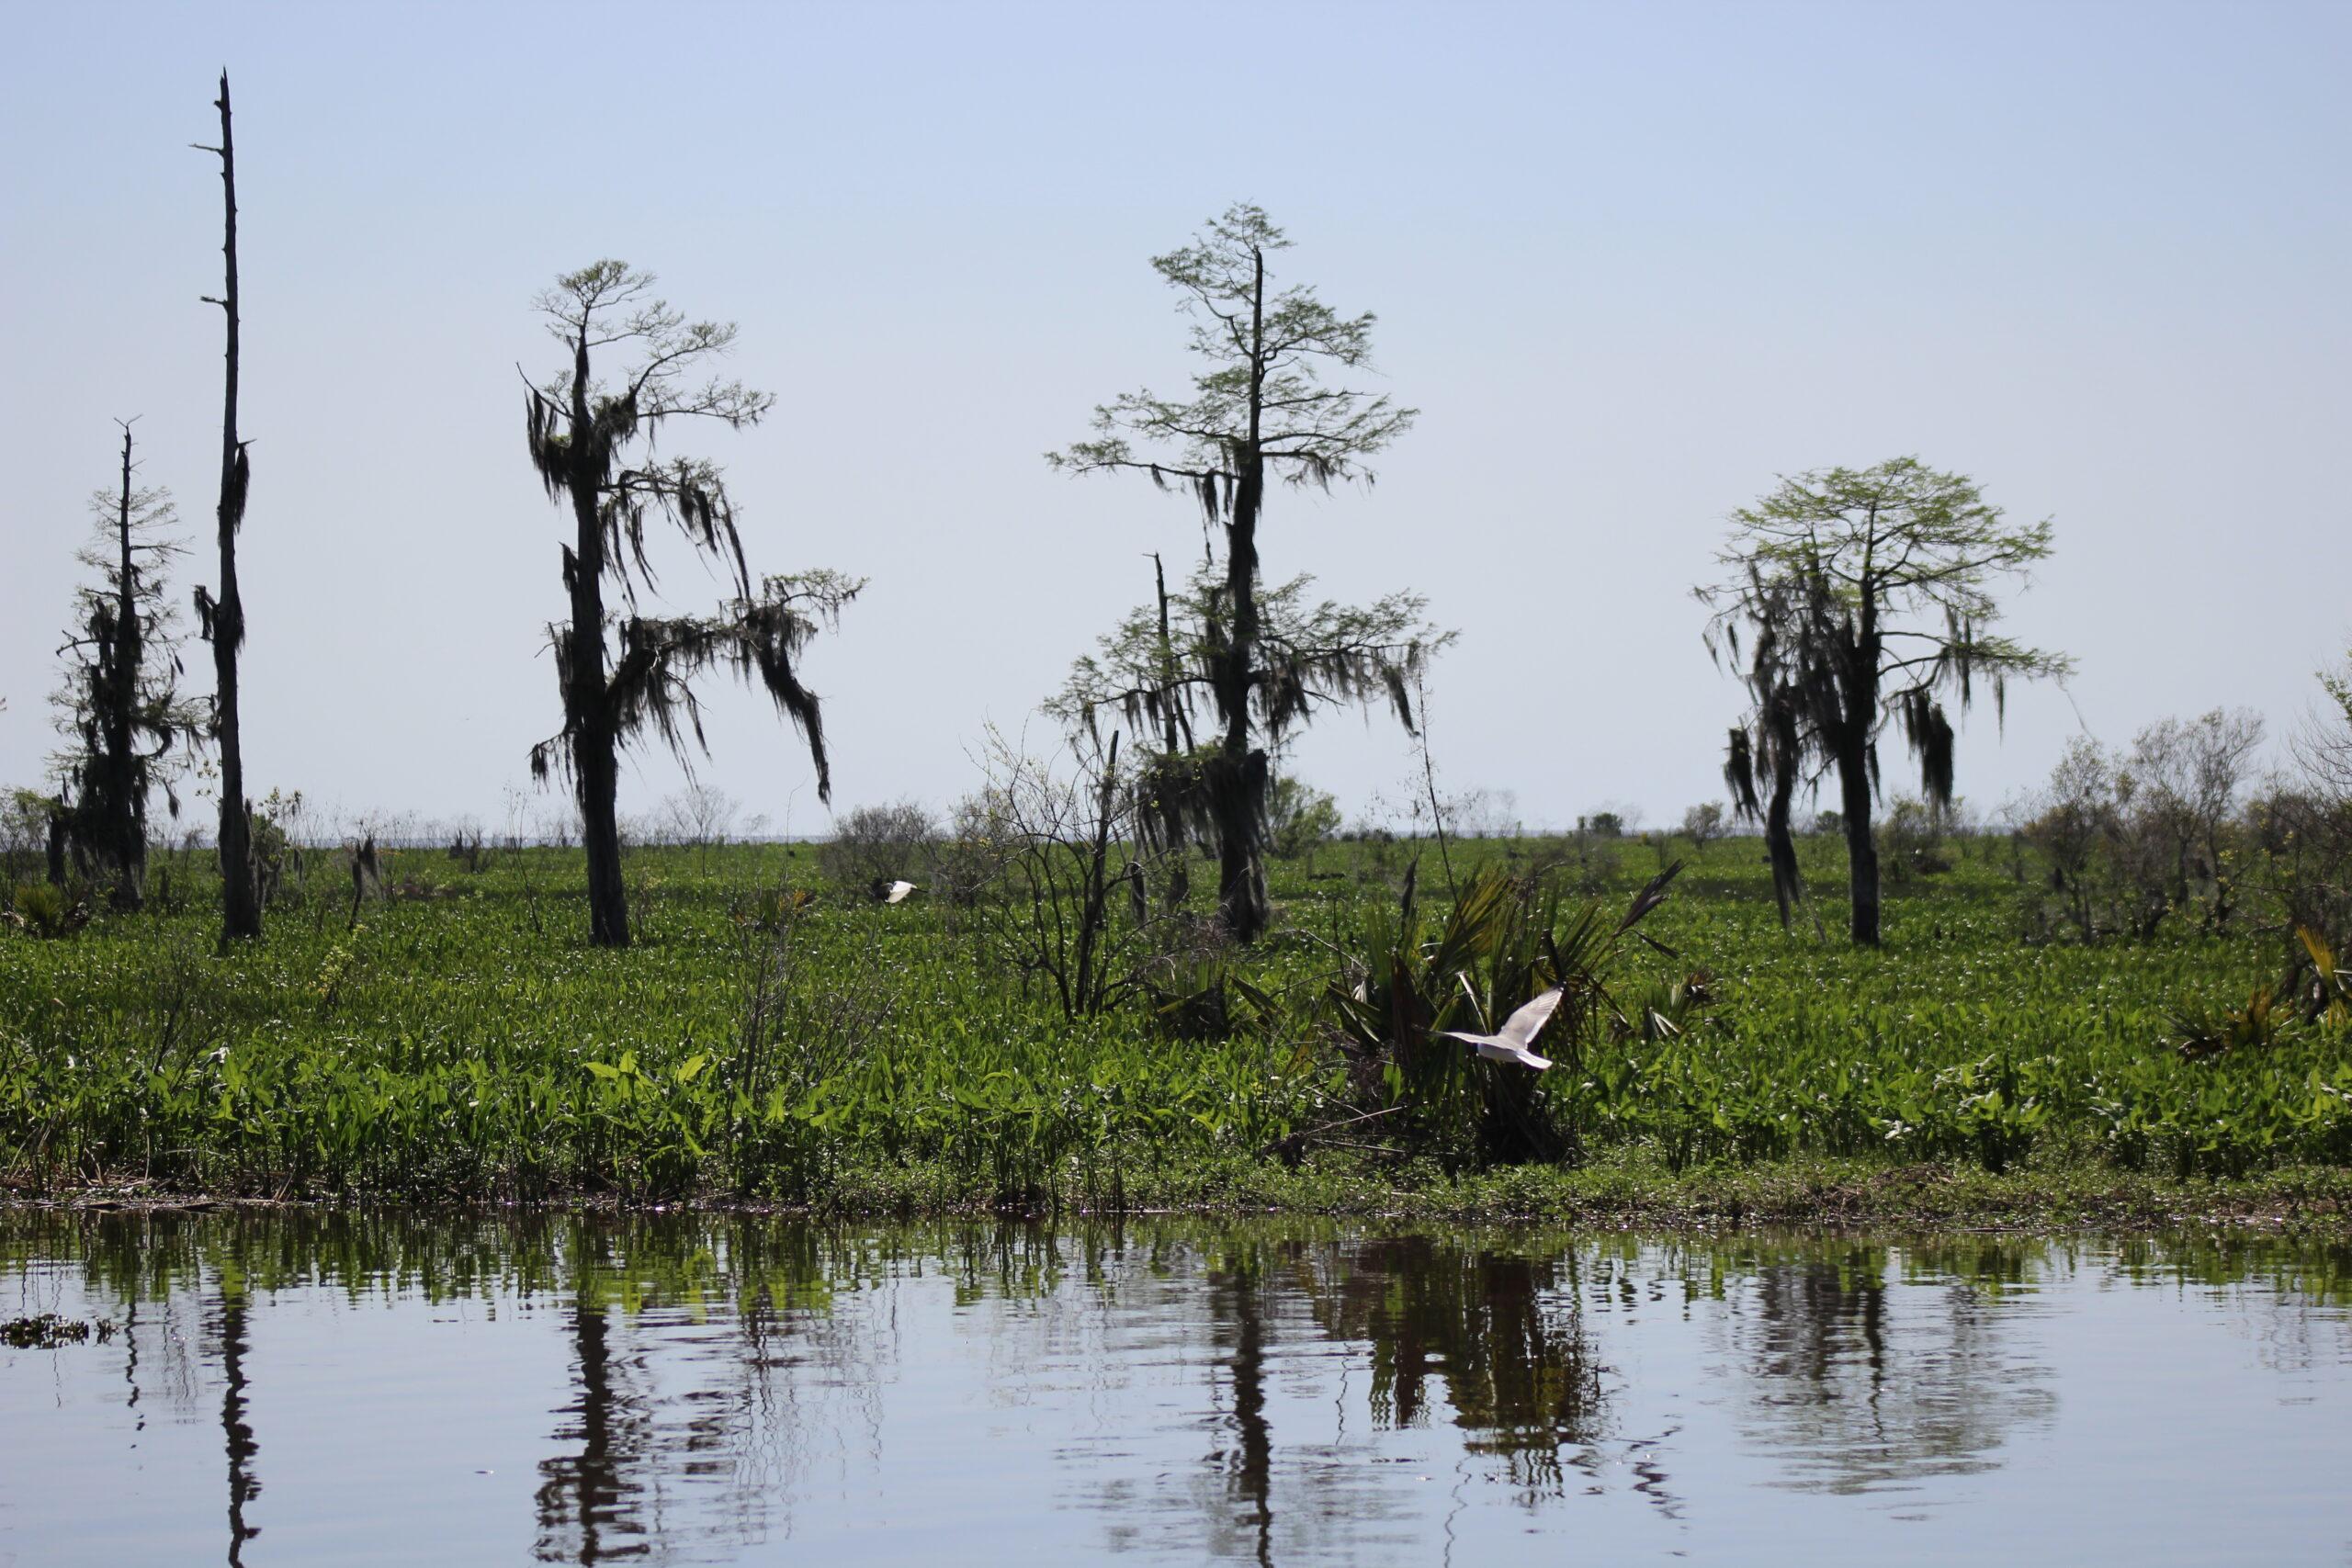 Cypress tree legislation clears House committee